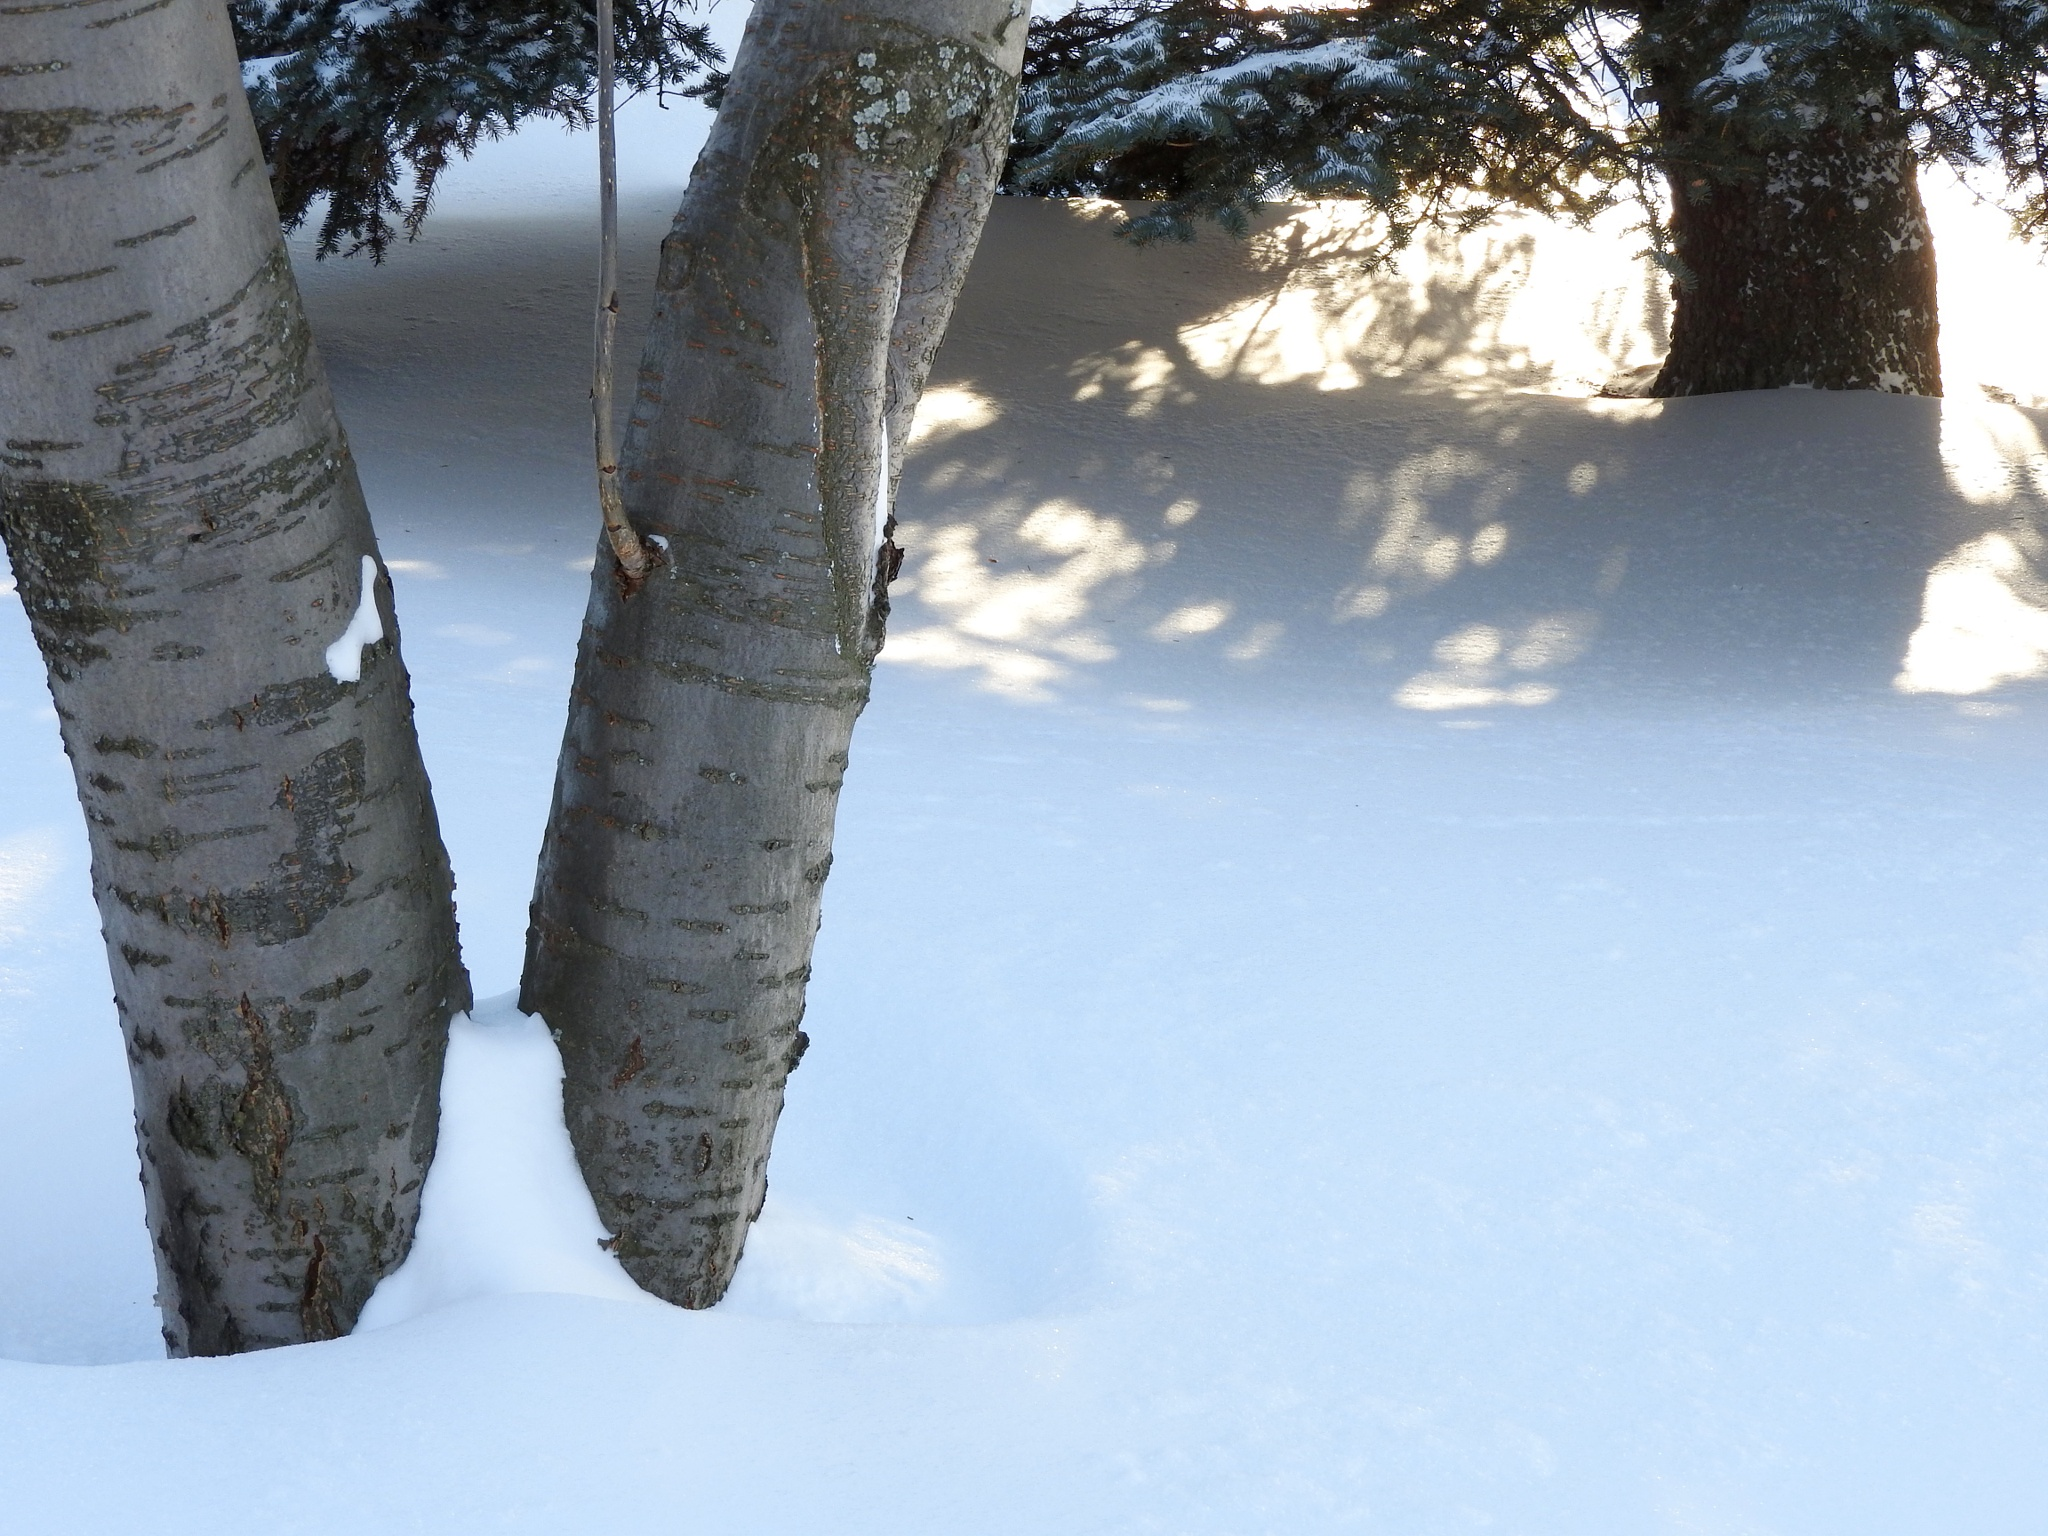 Untouched snow by Lorraine Furmanic